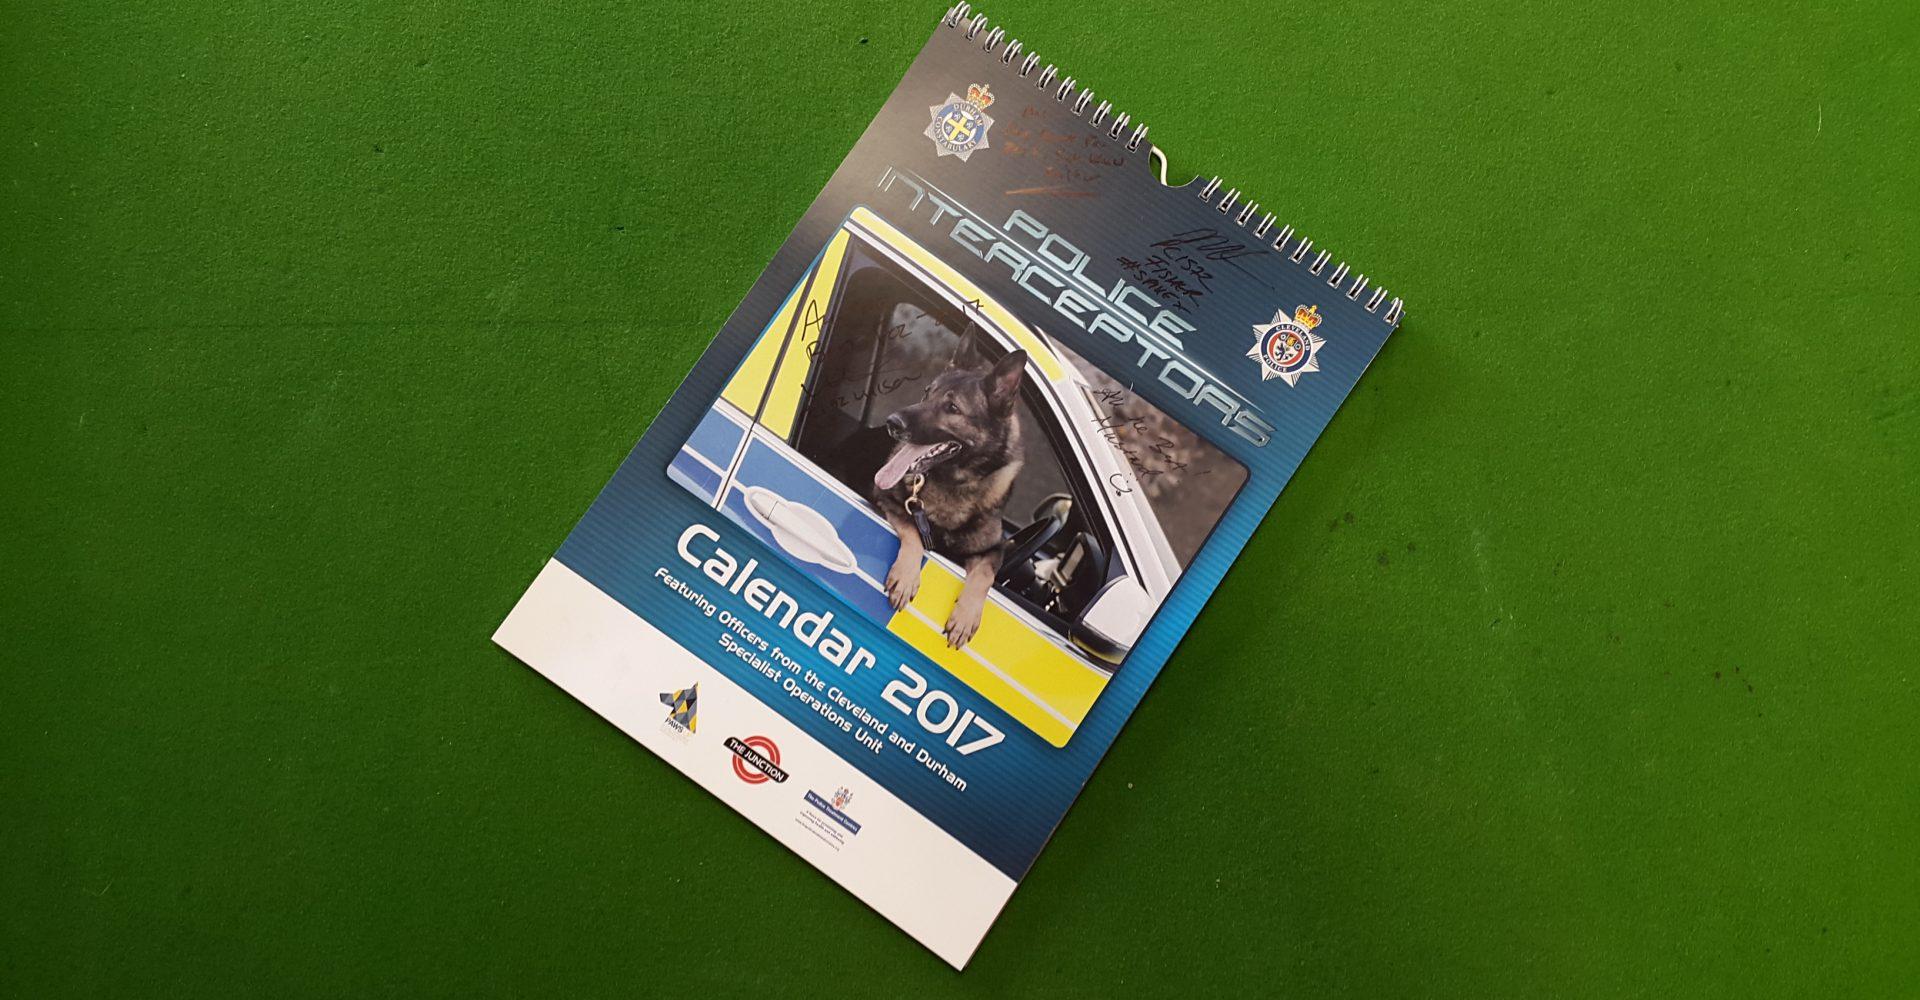 Win A Signed Police Interceptors 2017 Calendar Featuring Sergeant Kev Salter!